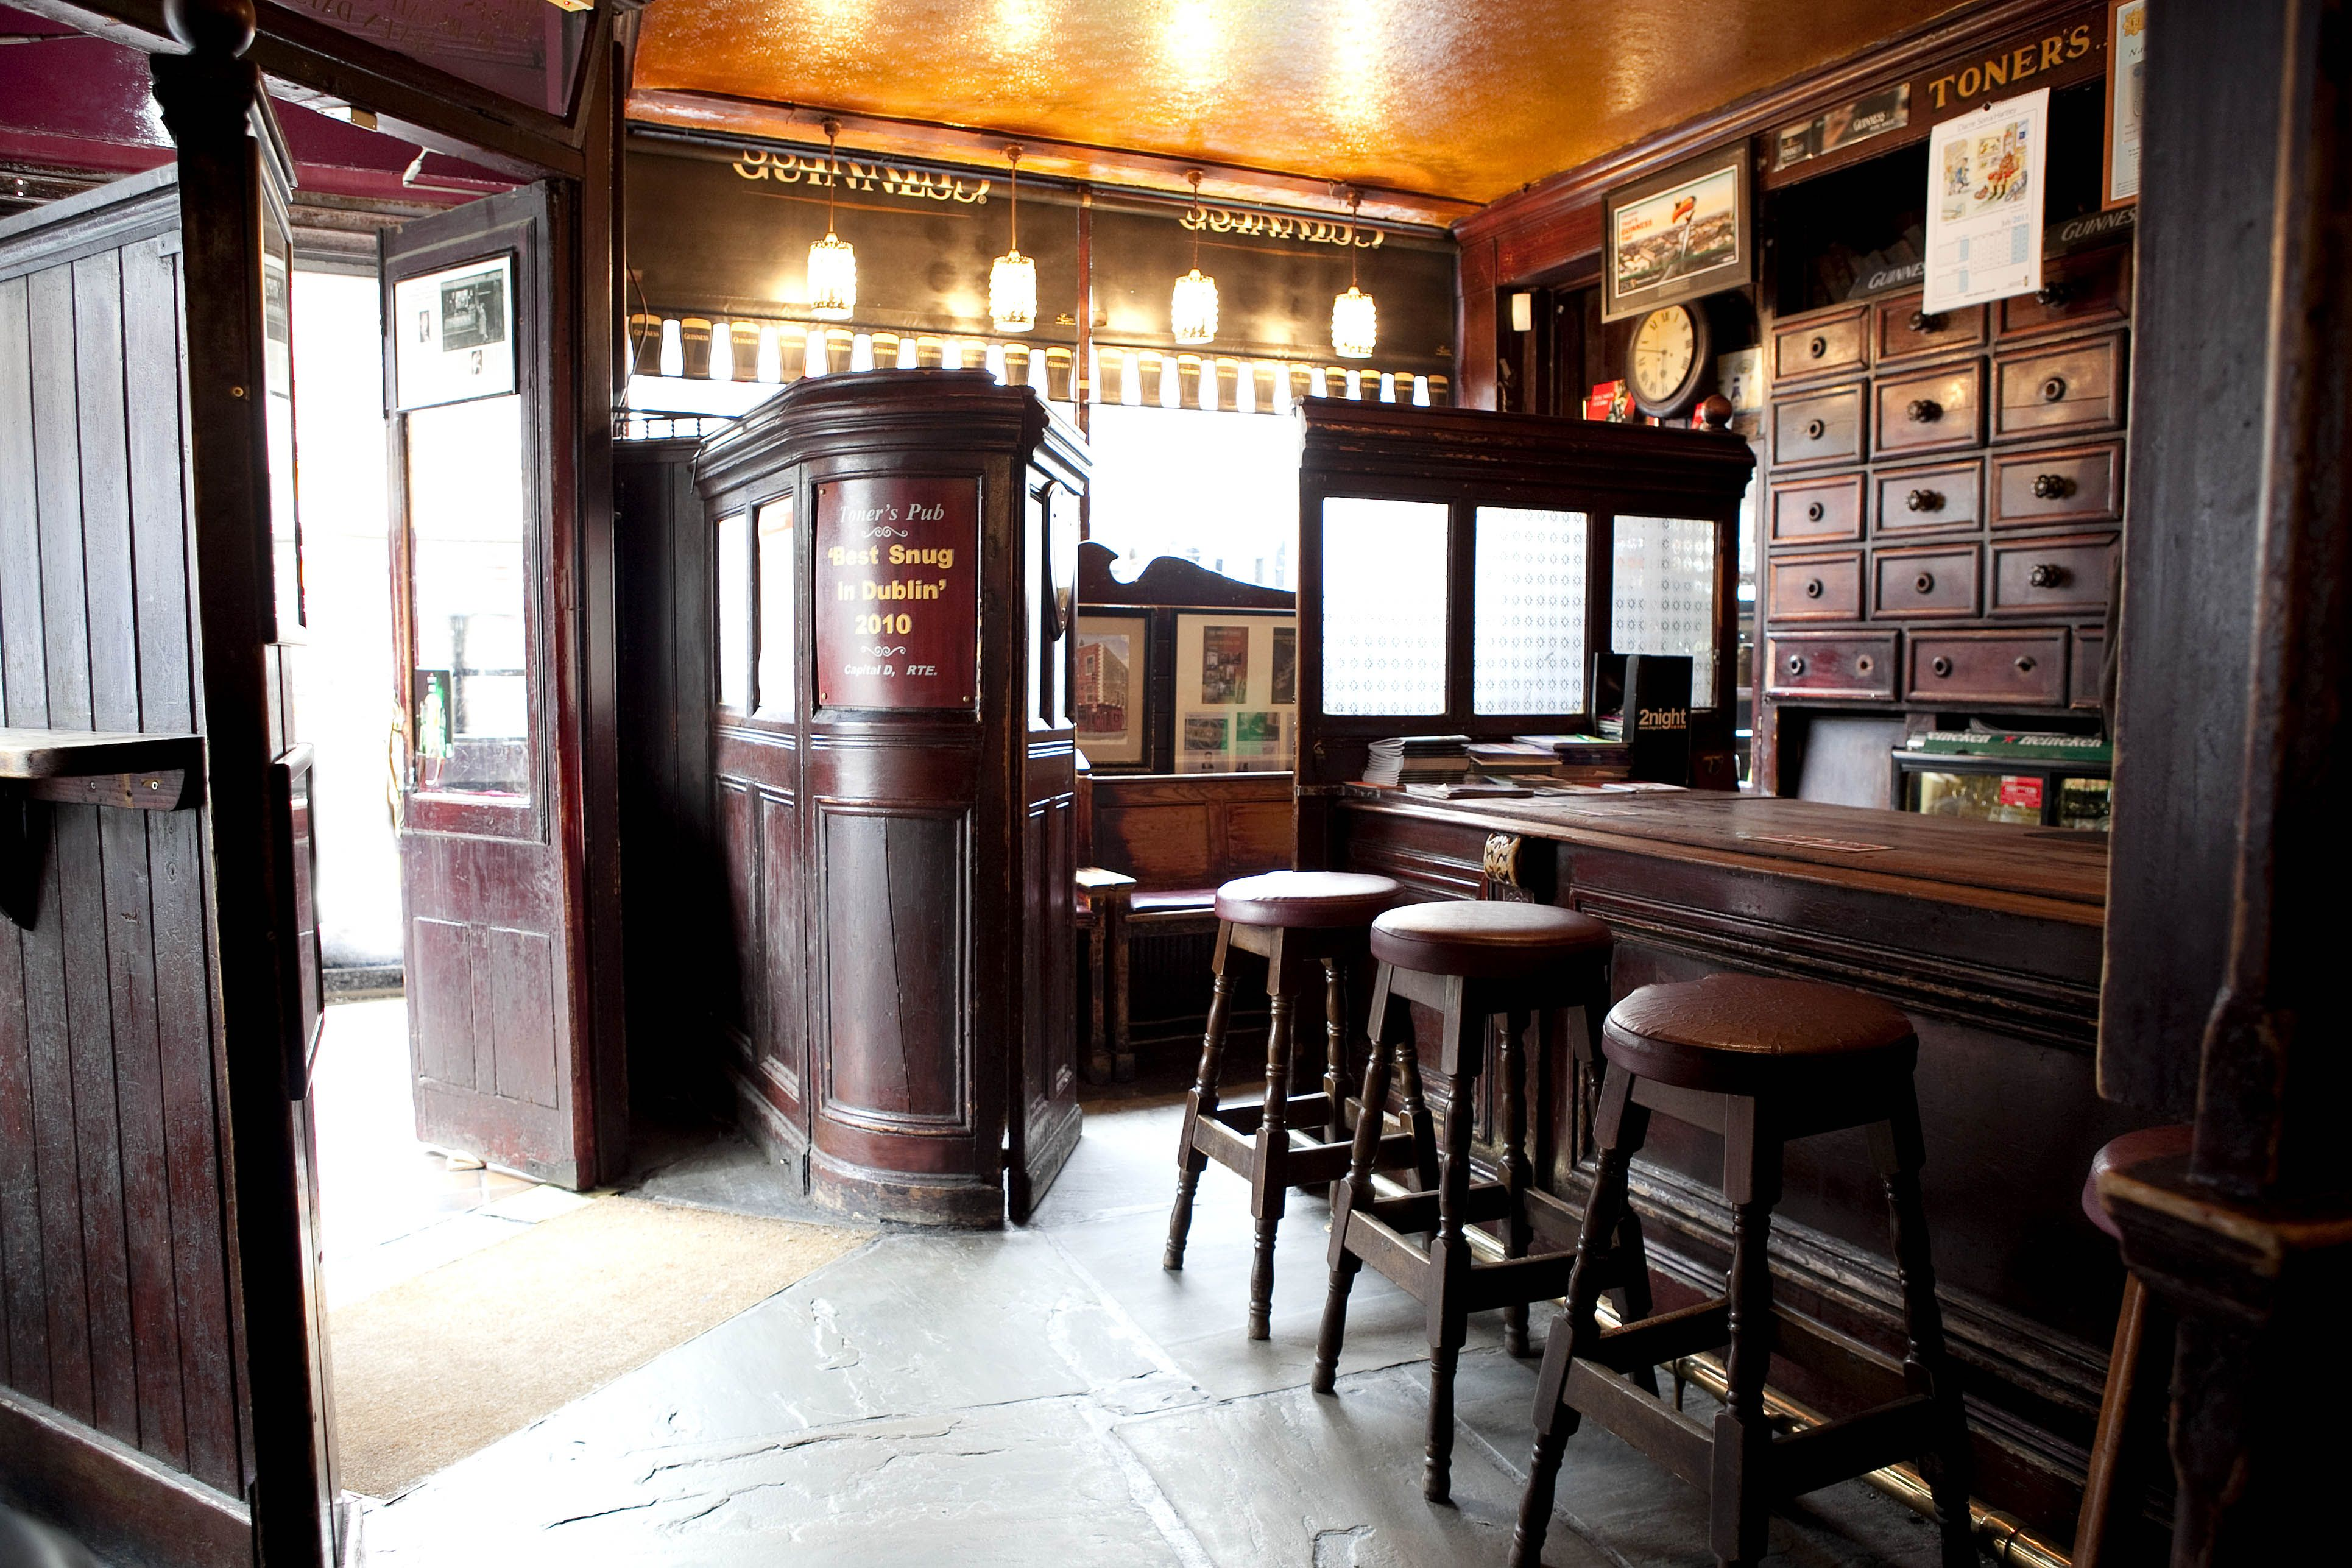 Irish Pub Toners Baggot Street Dublin Check Out The Award Winning Snug Inside